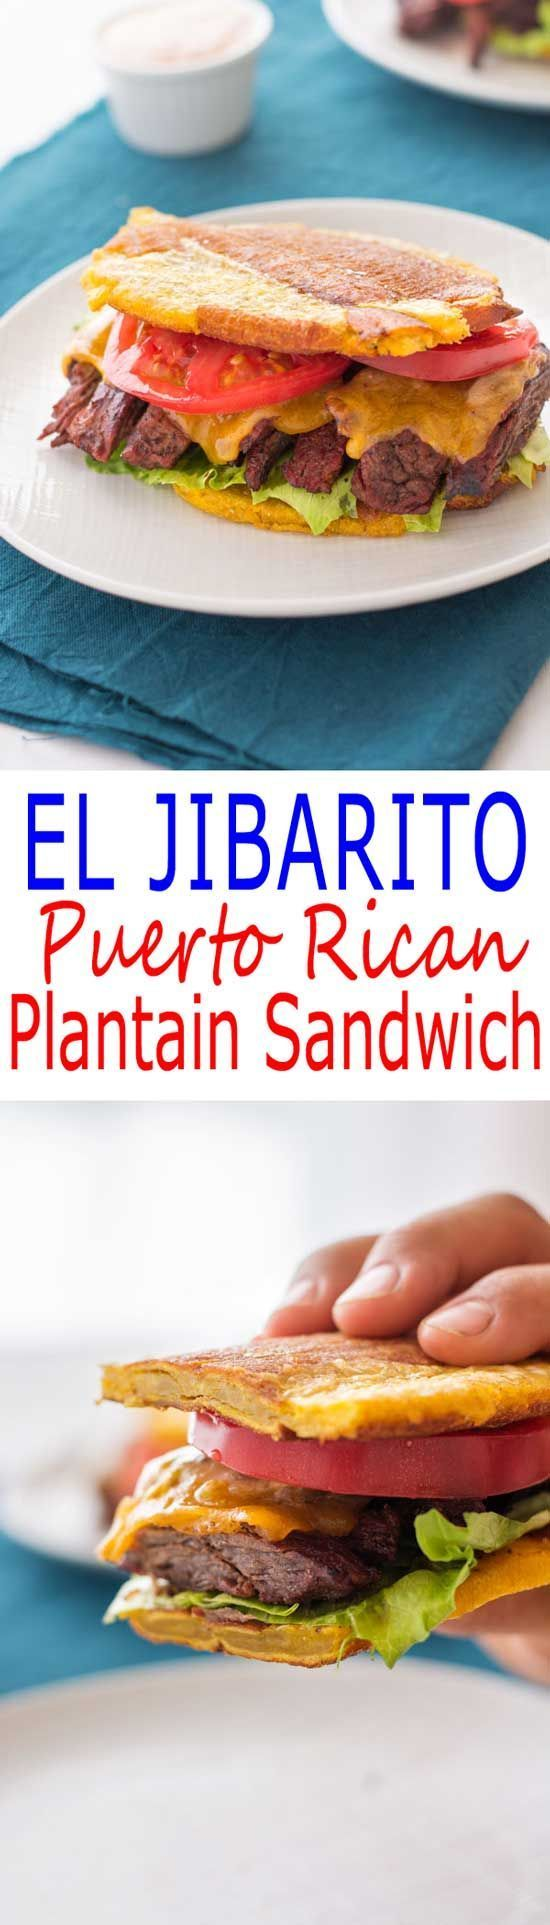 65 best recetas de sandwichs images on pinterest aerobic exercises jibarito recipe puerto rican sandwich with steak using plantains instead of bread forumfinder Gallery